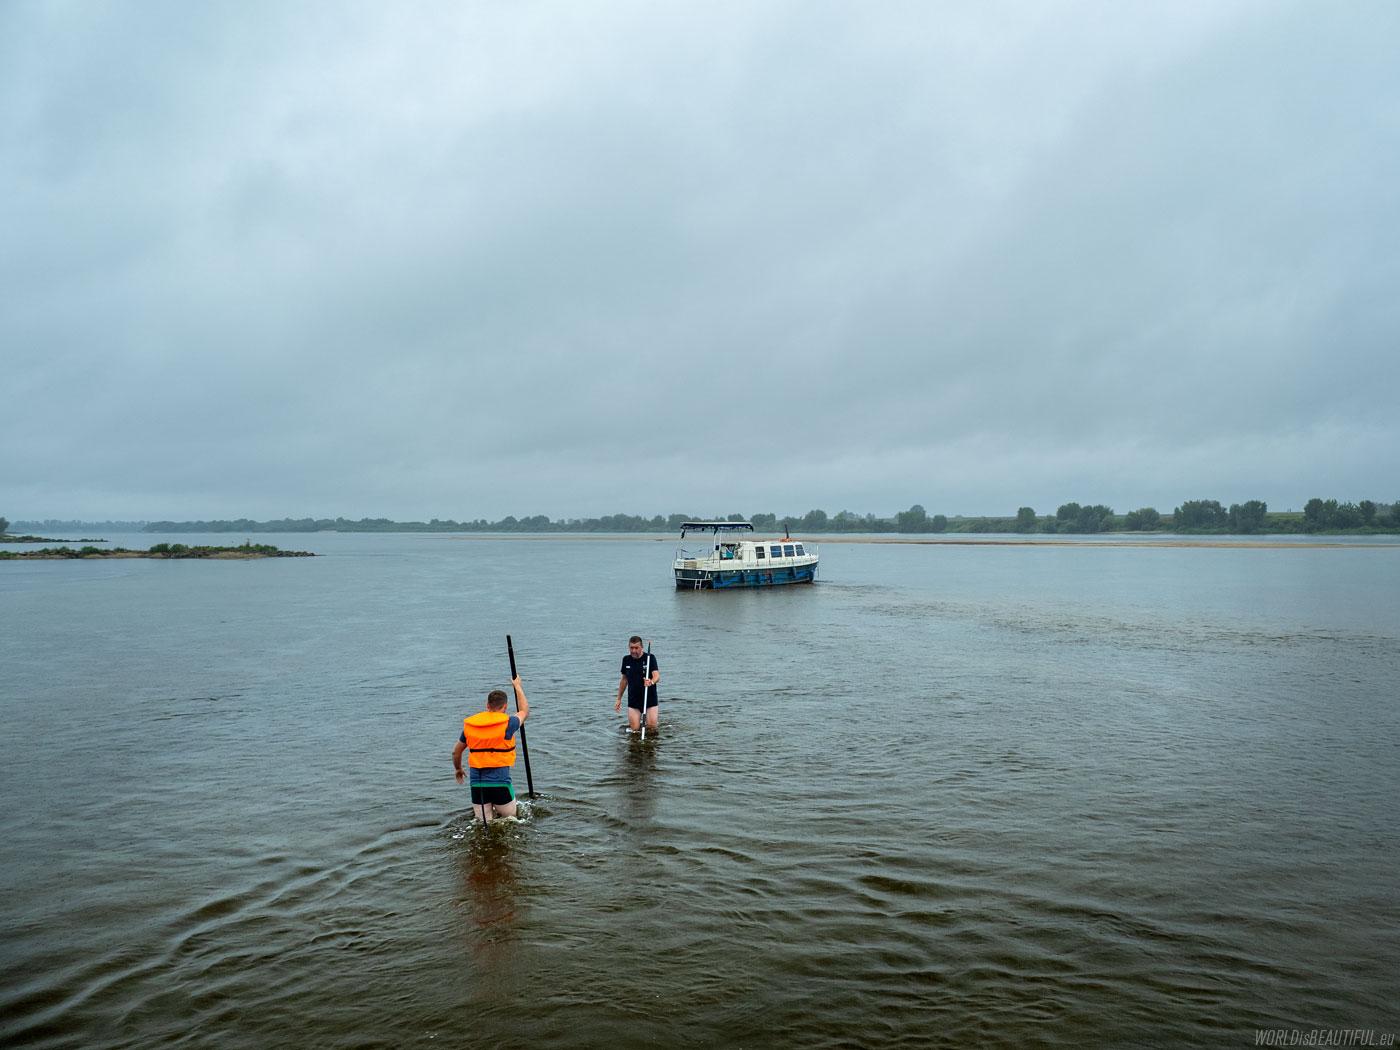 Rescue operation on the Vistula